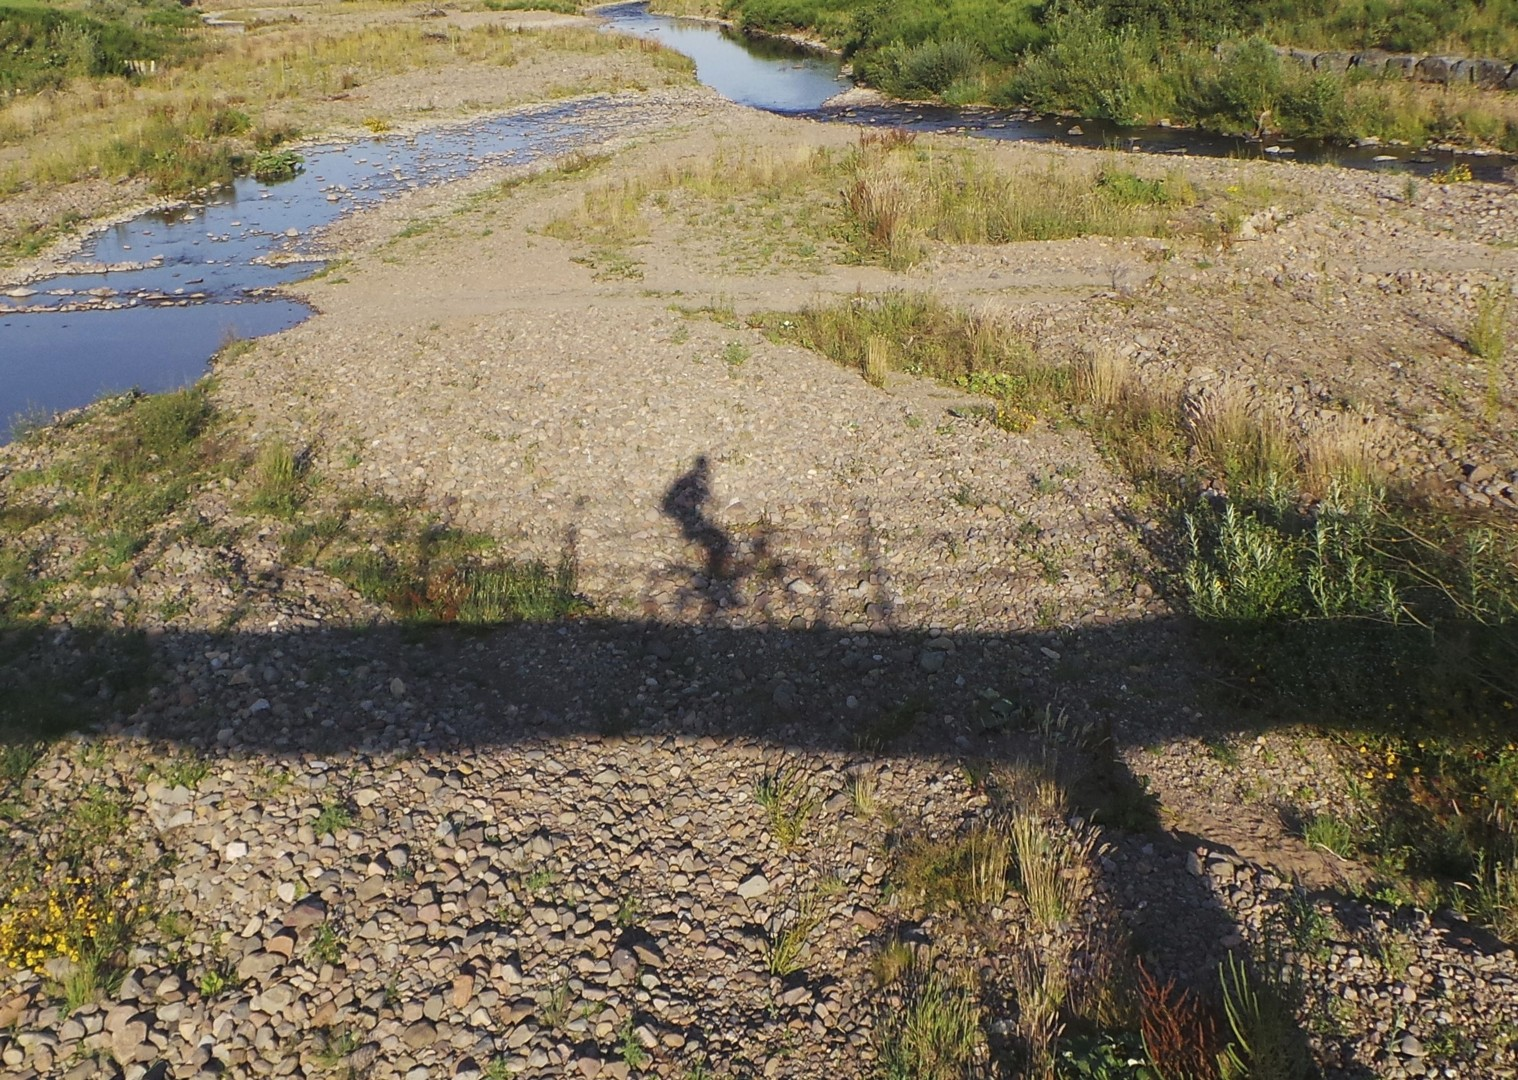 Standstoneway8.jpg - UK - Northumberland - Sandstone Way - Mountain Biking